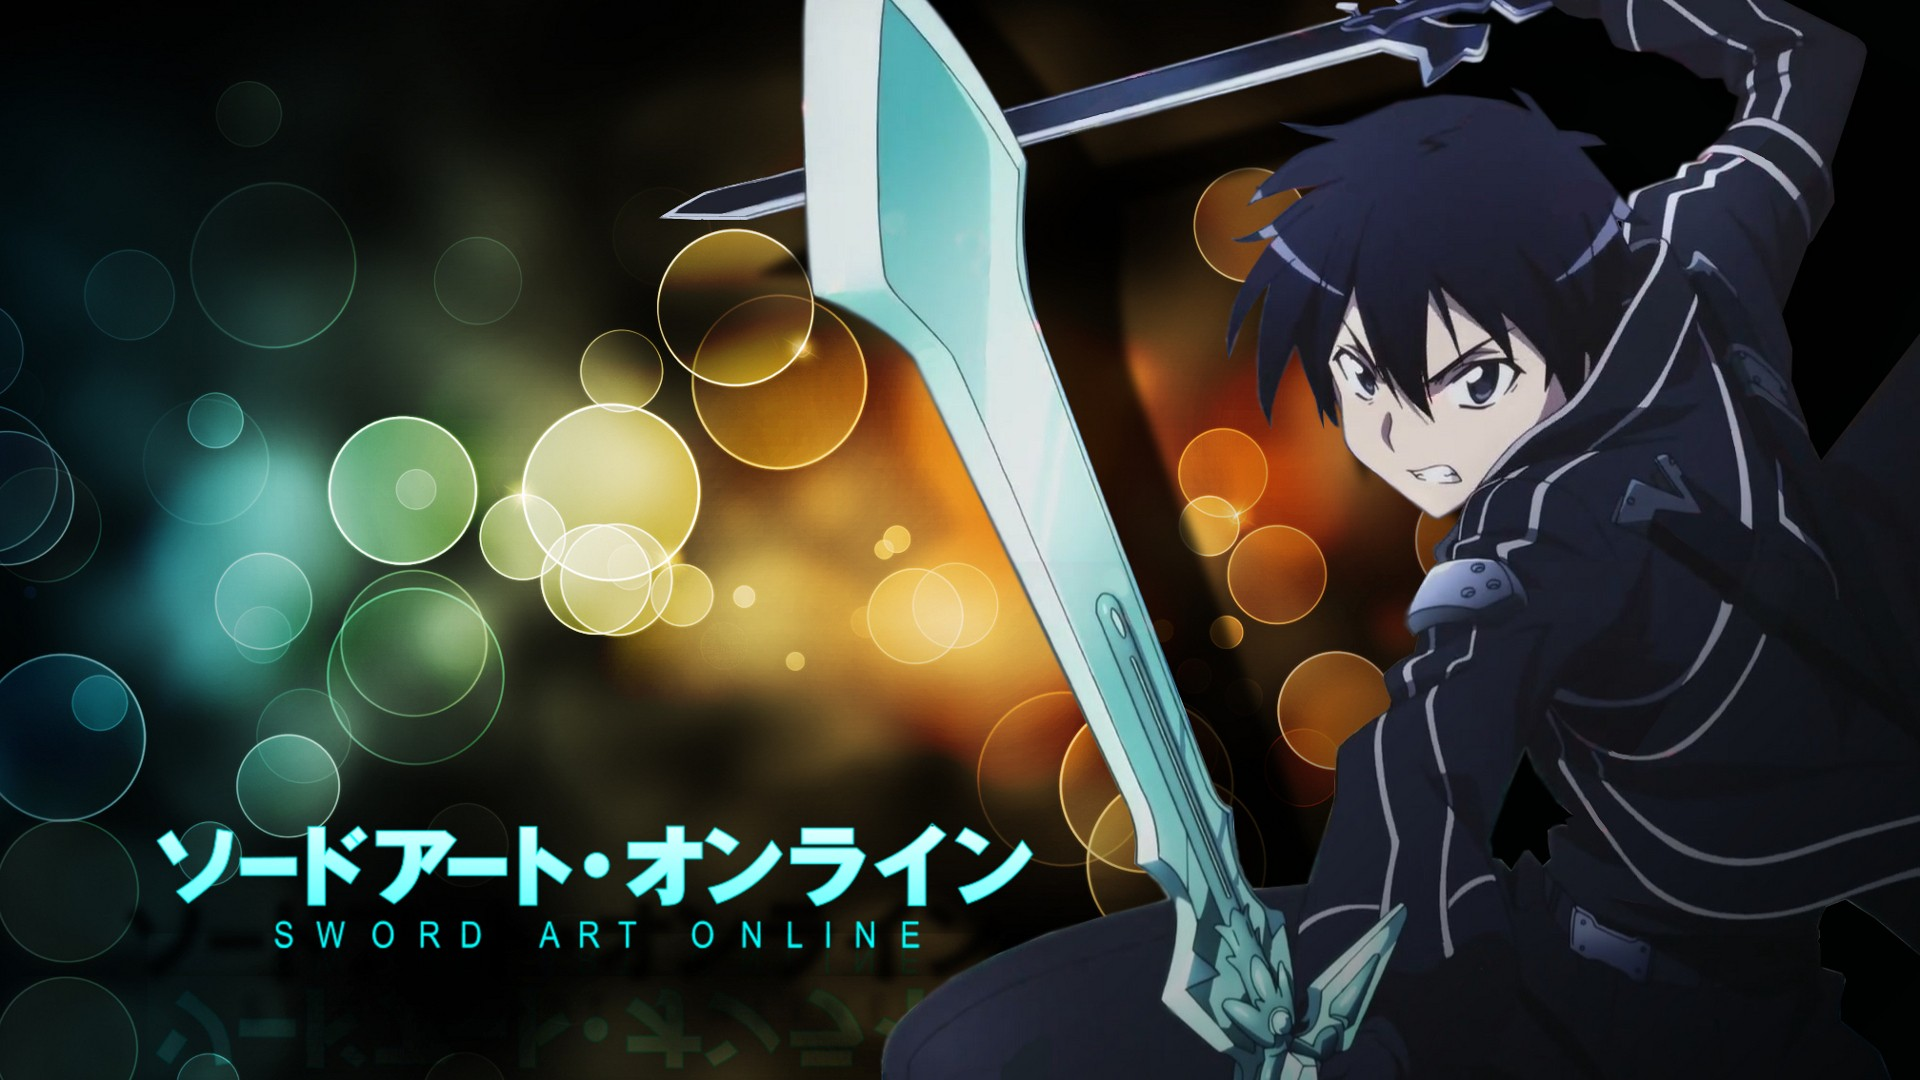 Sword Art Online HD Wallpaper